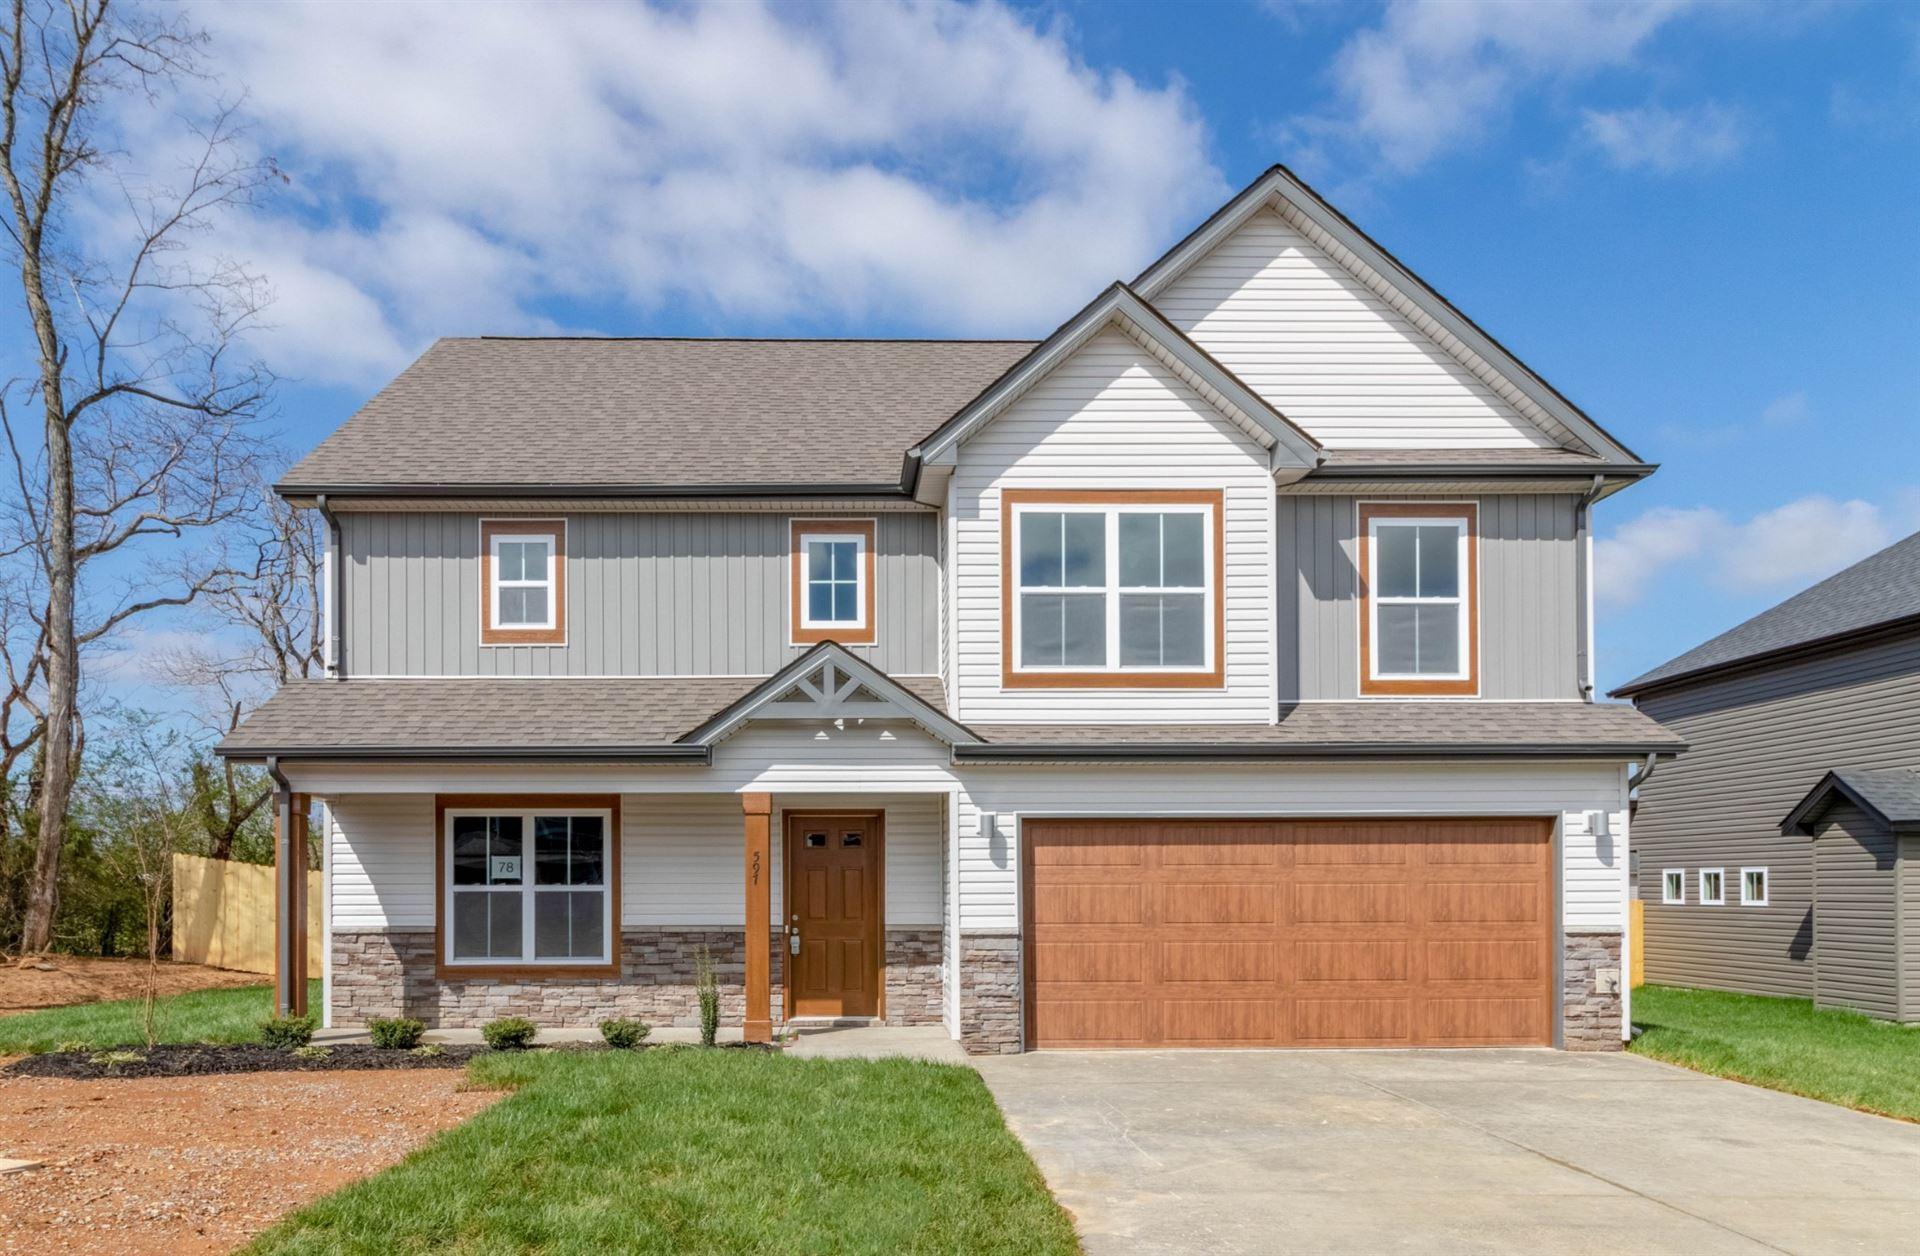 225 Mills Creek, Clarksville, TN 37042 - MLS#: 2299623